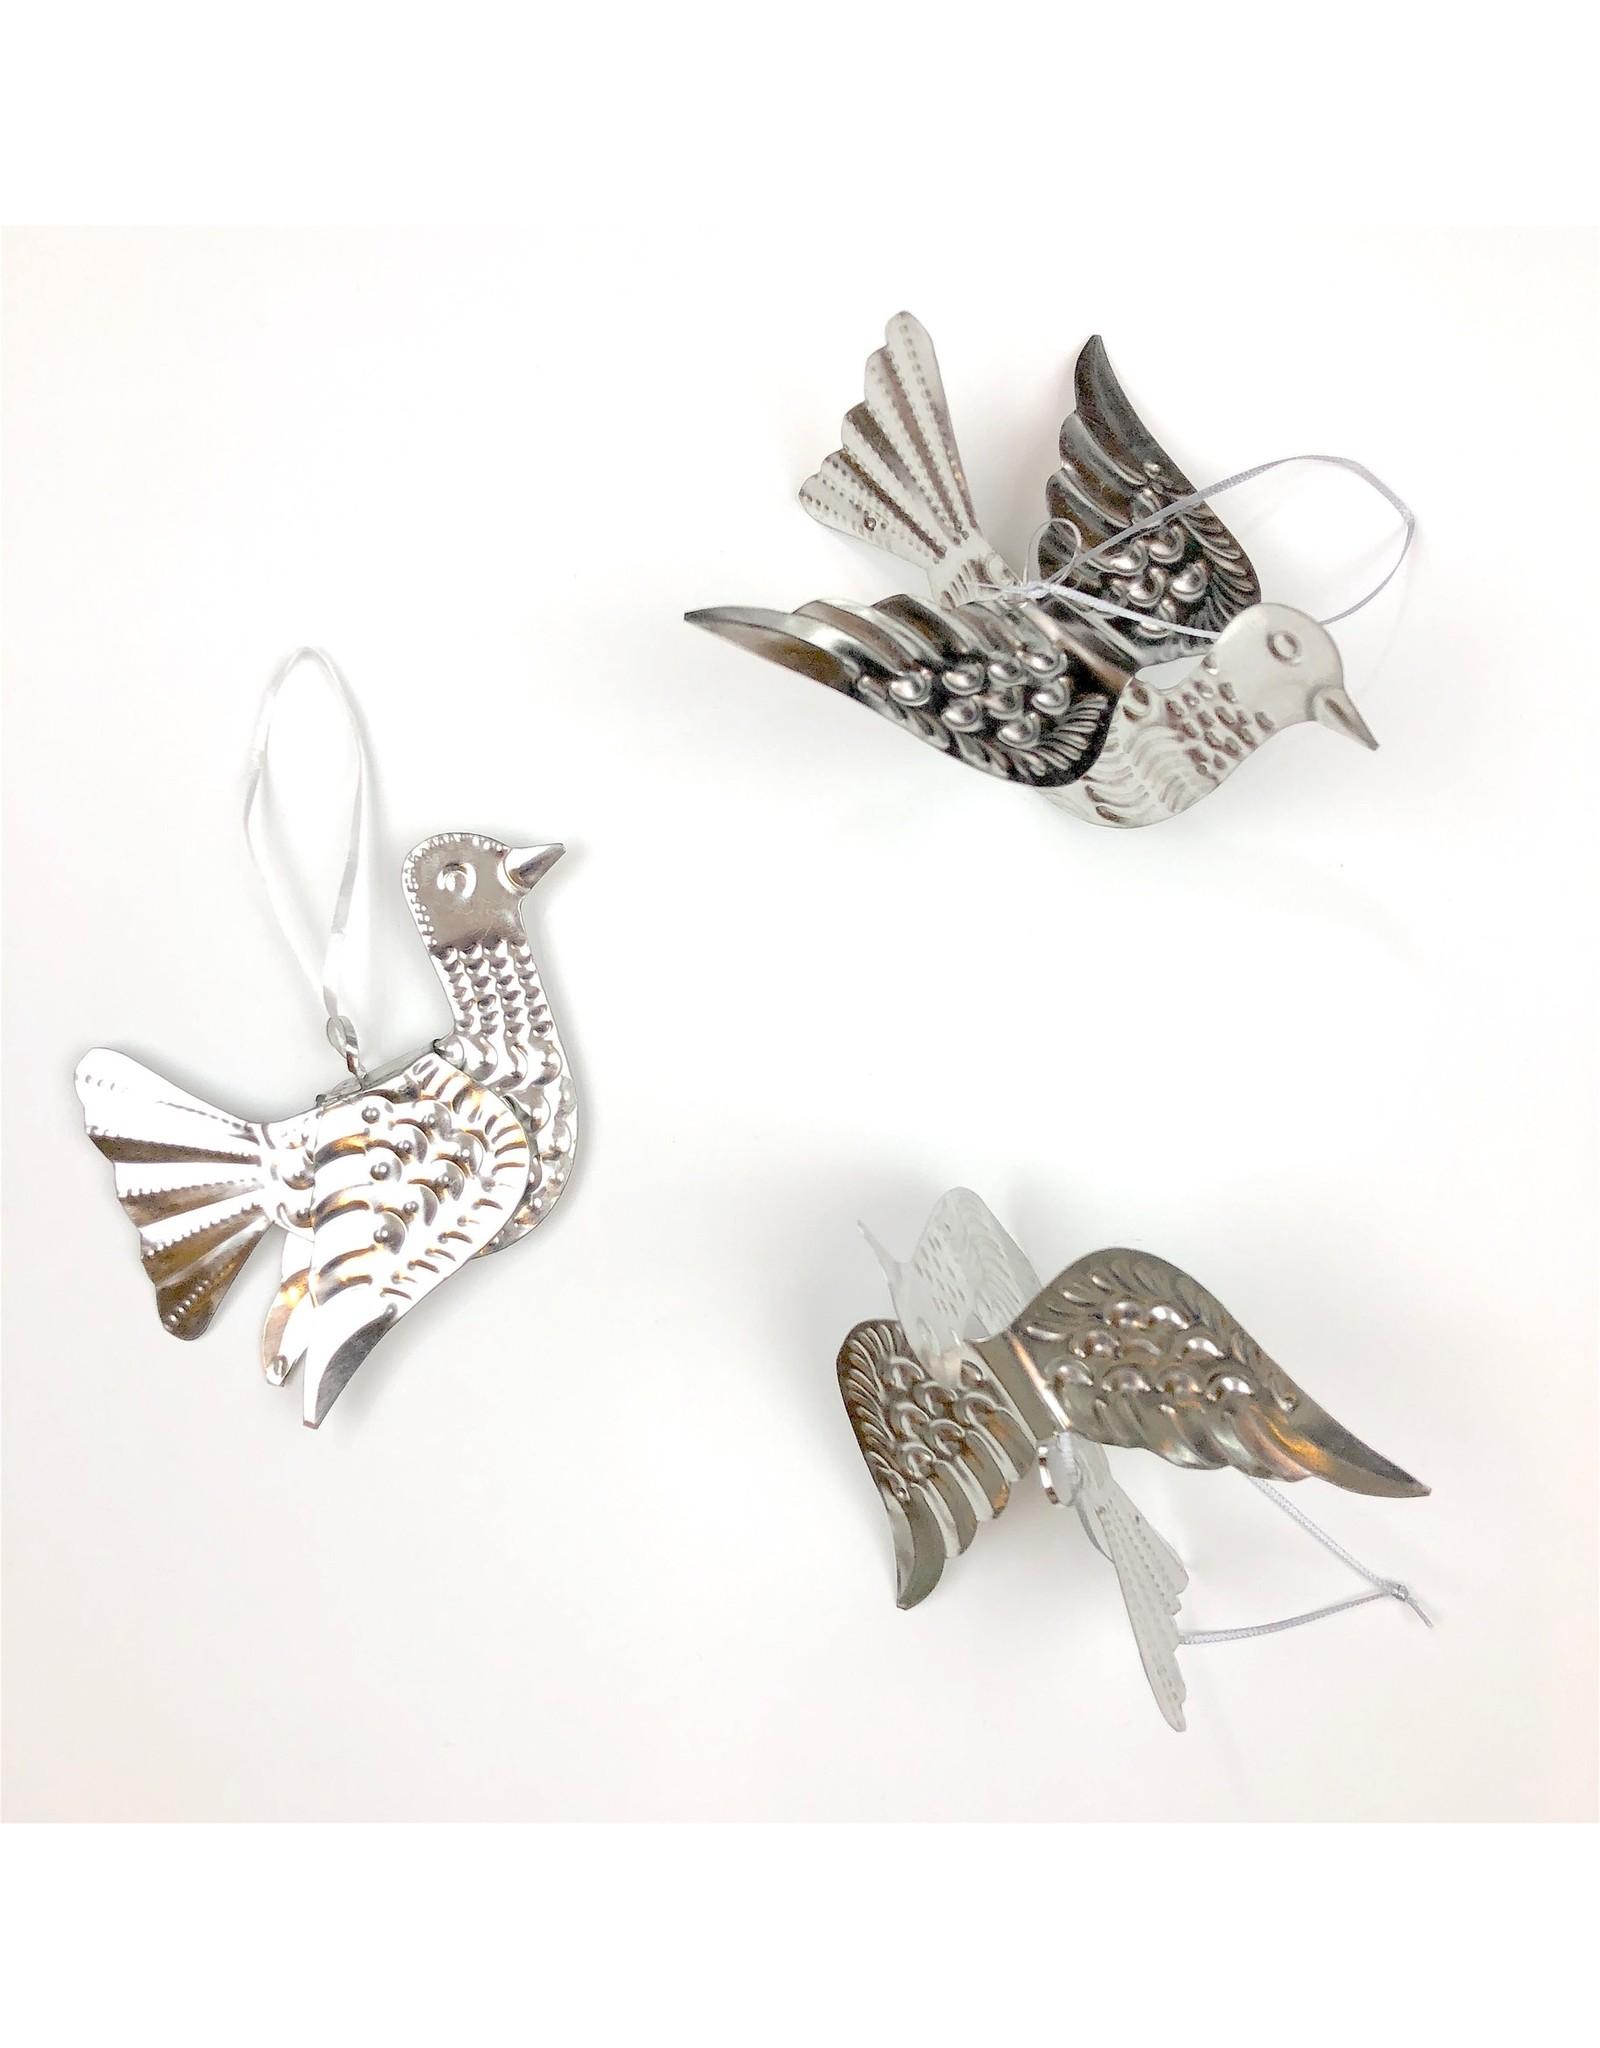 Abrazo Style Tin Bird Ornament, Mexico